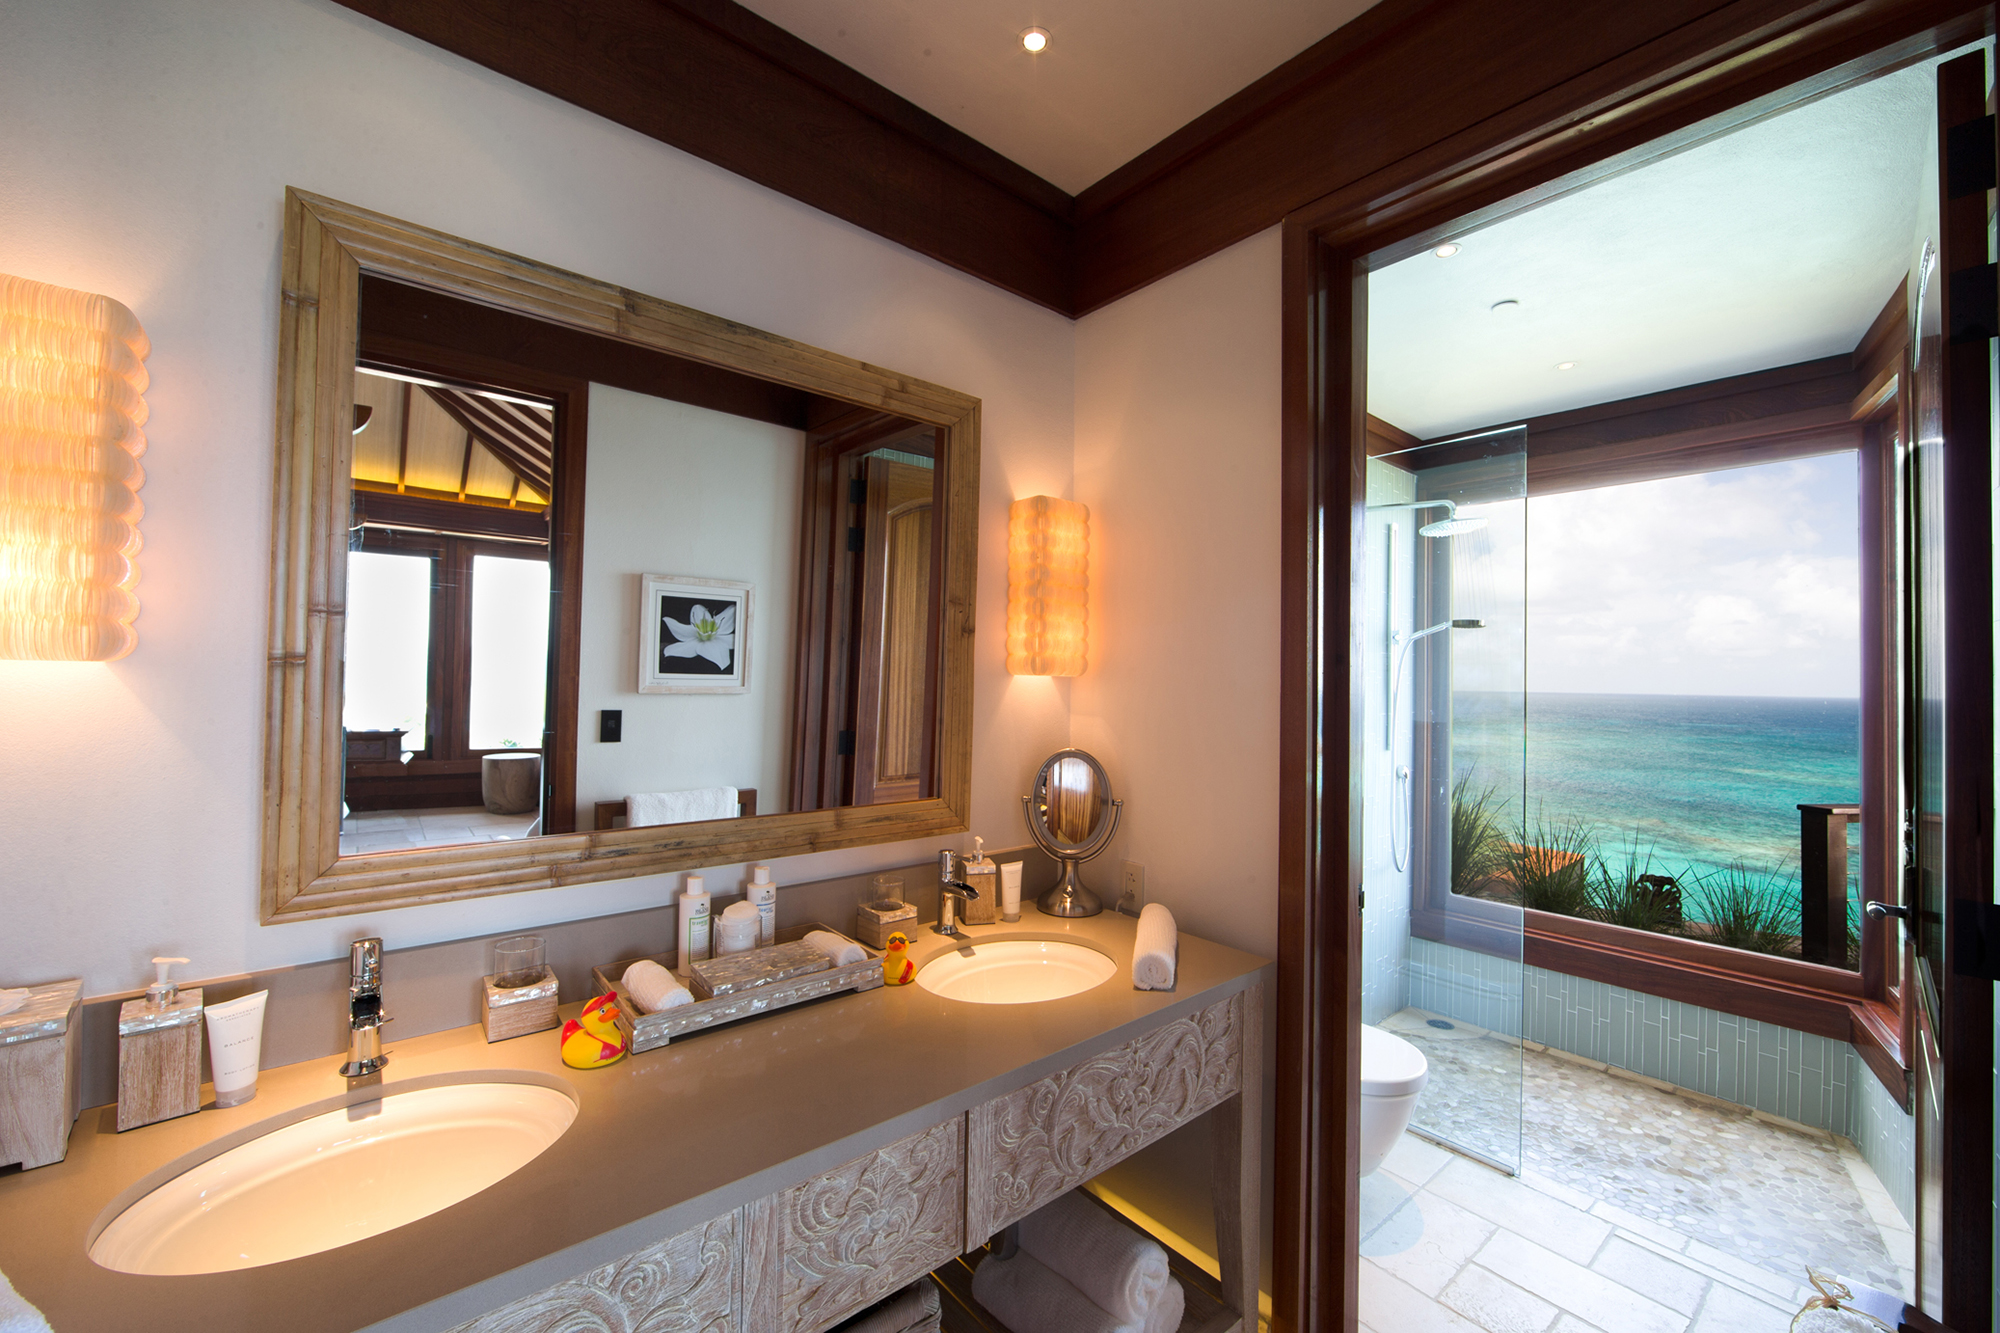 necker-island-room4-bathroom.jpg